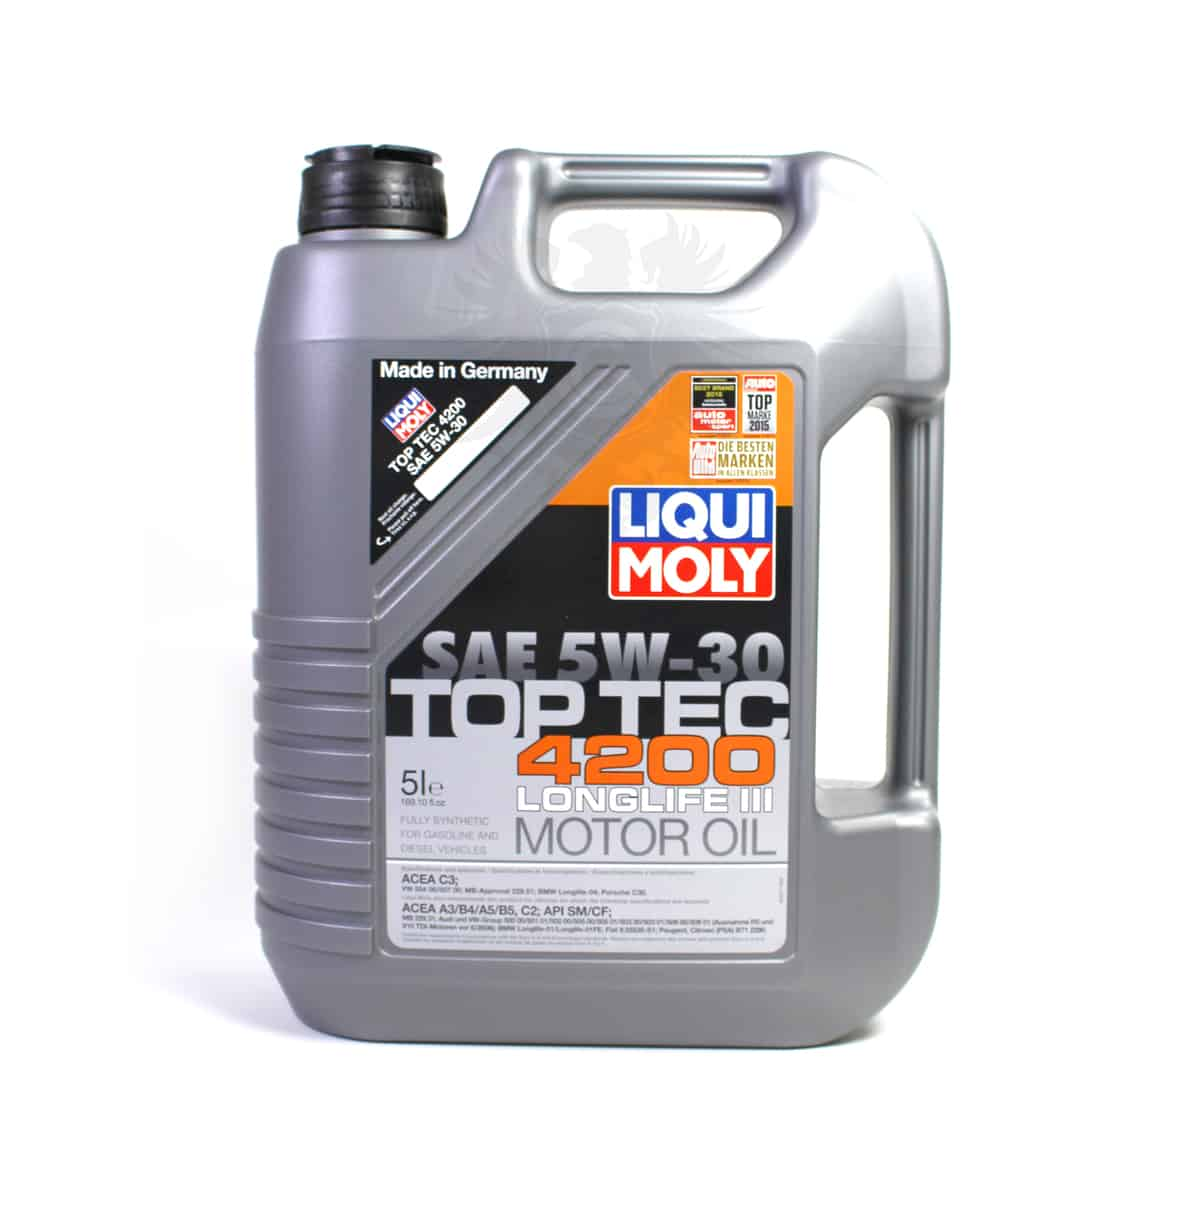 Engine Oil, Liqui Moly 504.00/507.00 5W30 (5L)